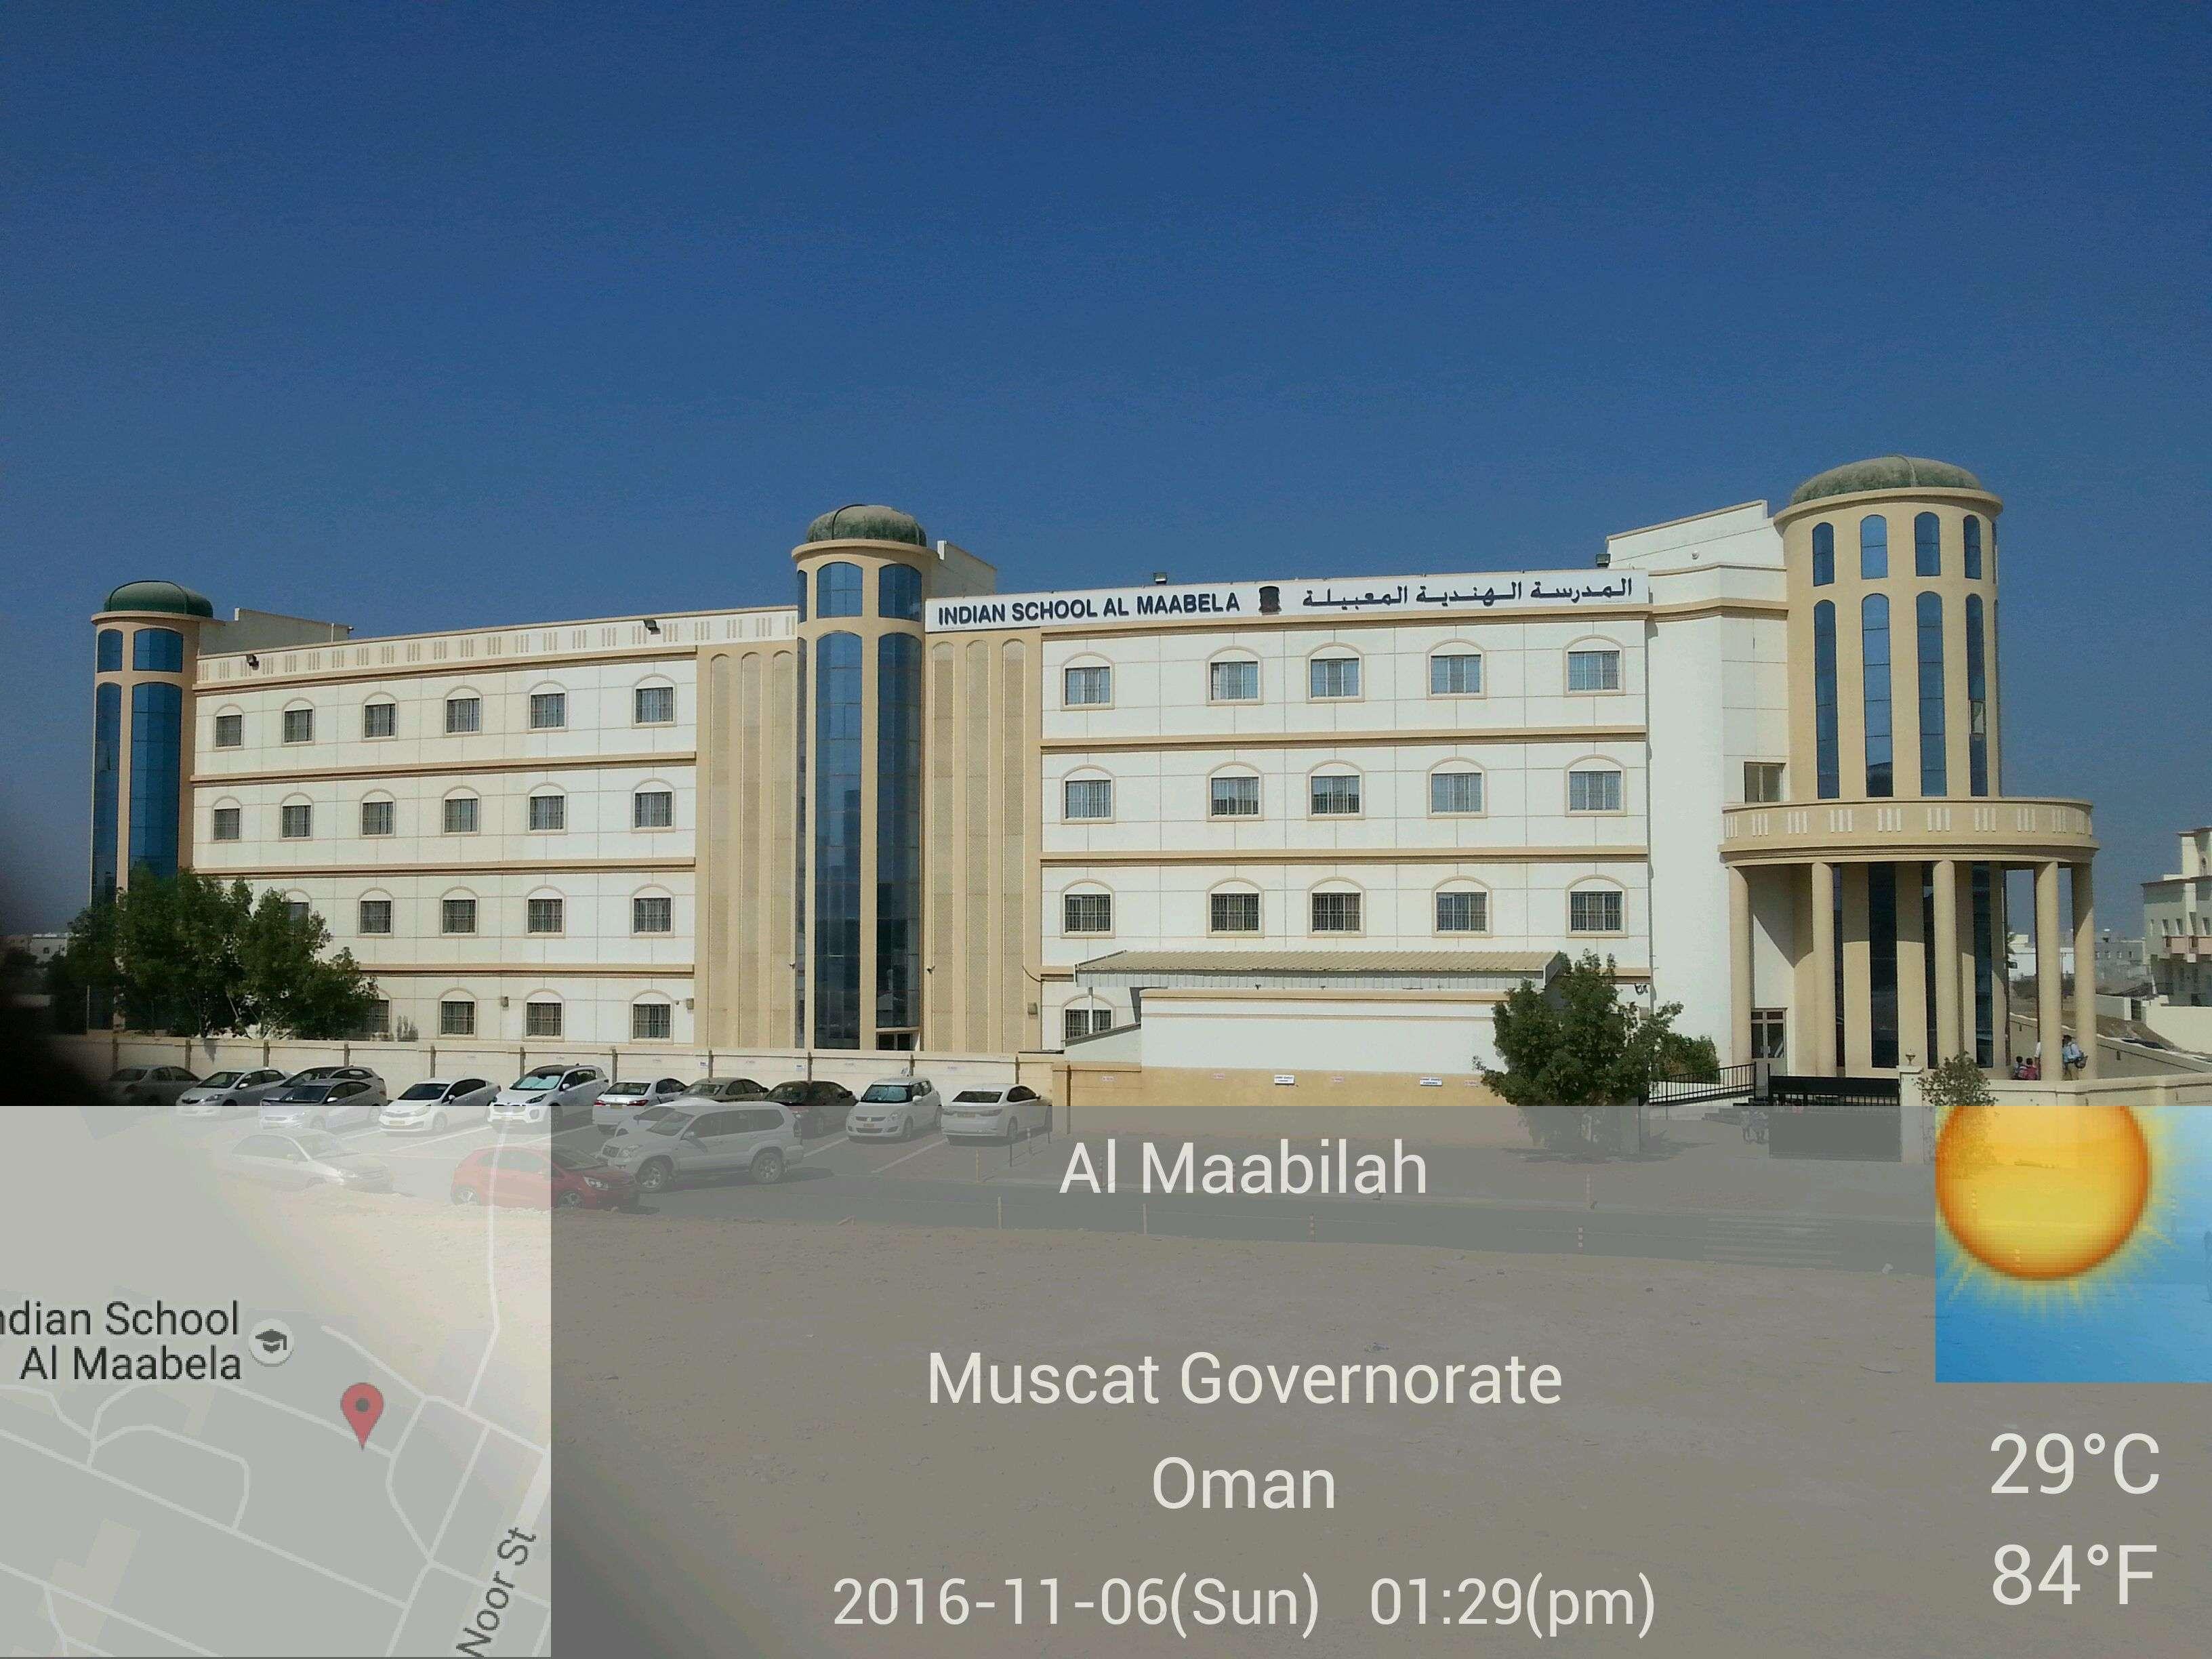 INDIAN SCHOOL AL MAABELA Post box No 134 Al Maabela Postal Code 122 Sultanate of Oman 6130013